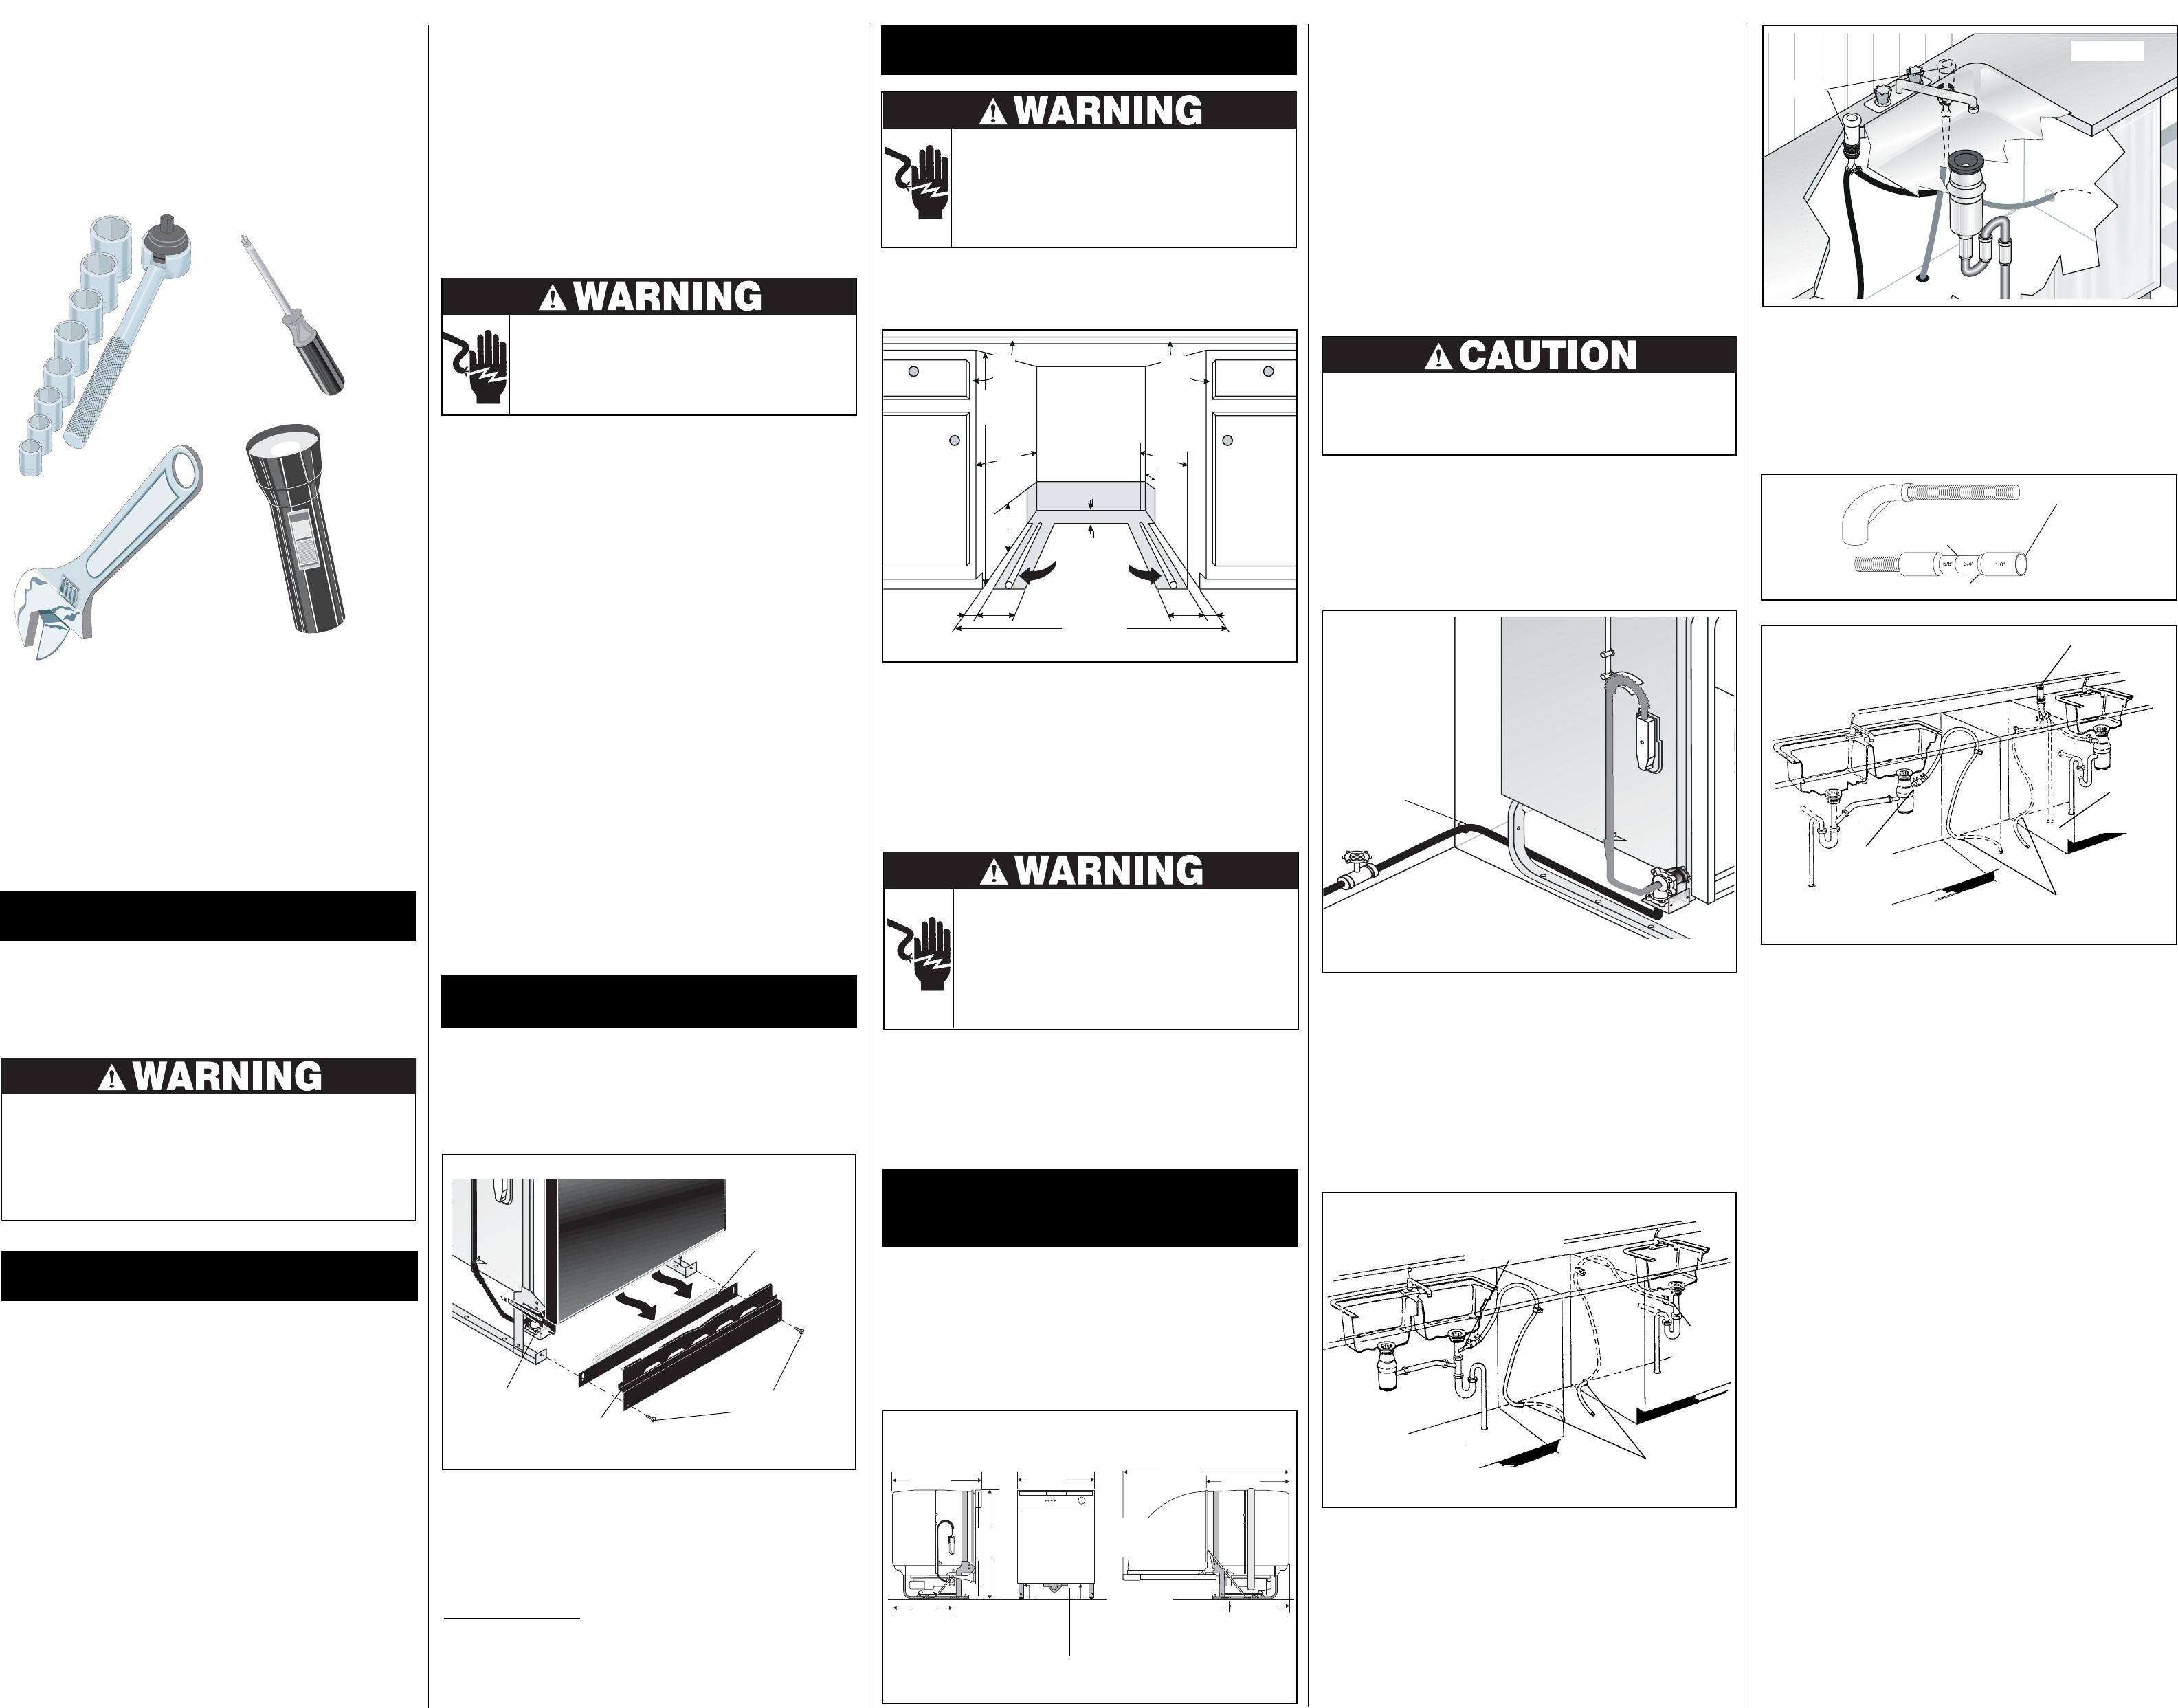 frigidaire dishwasher electrical diagram